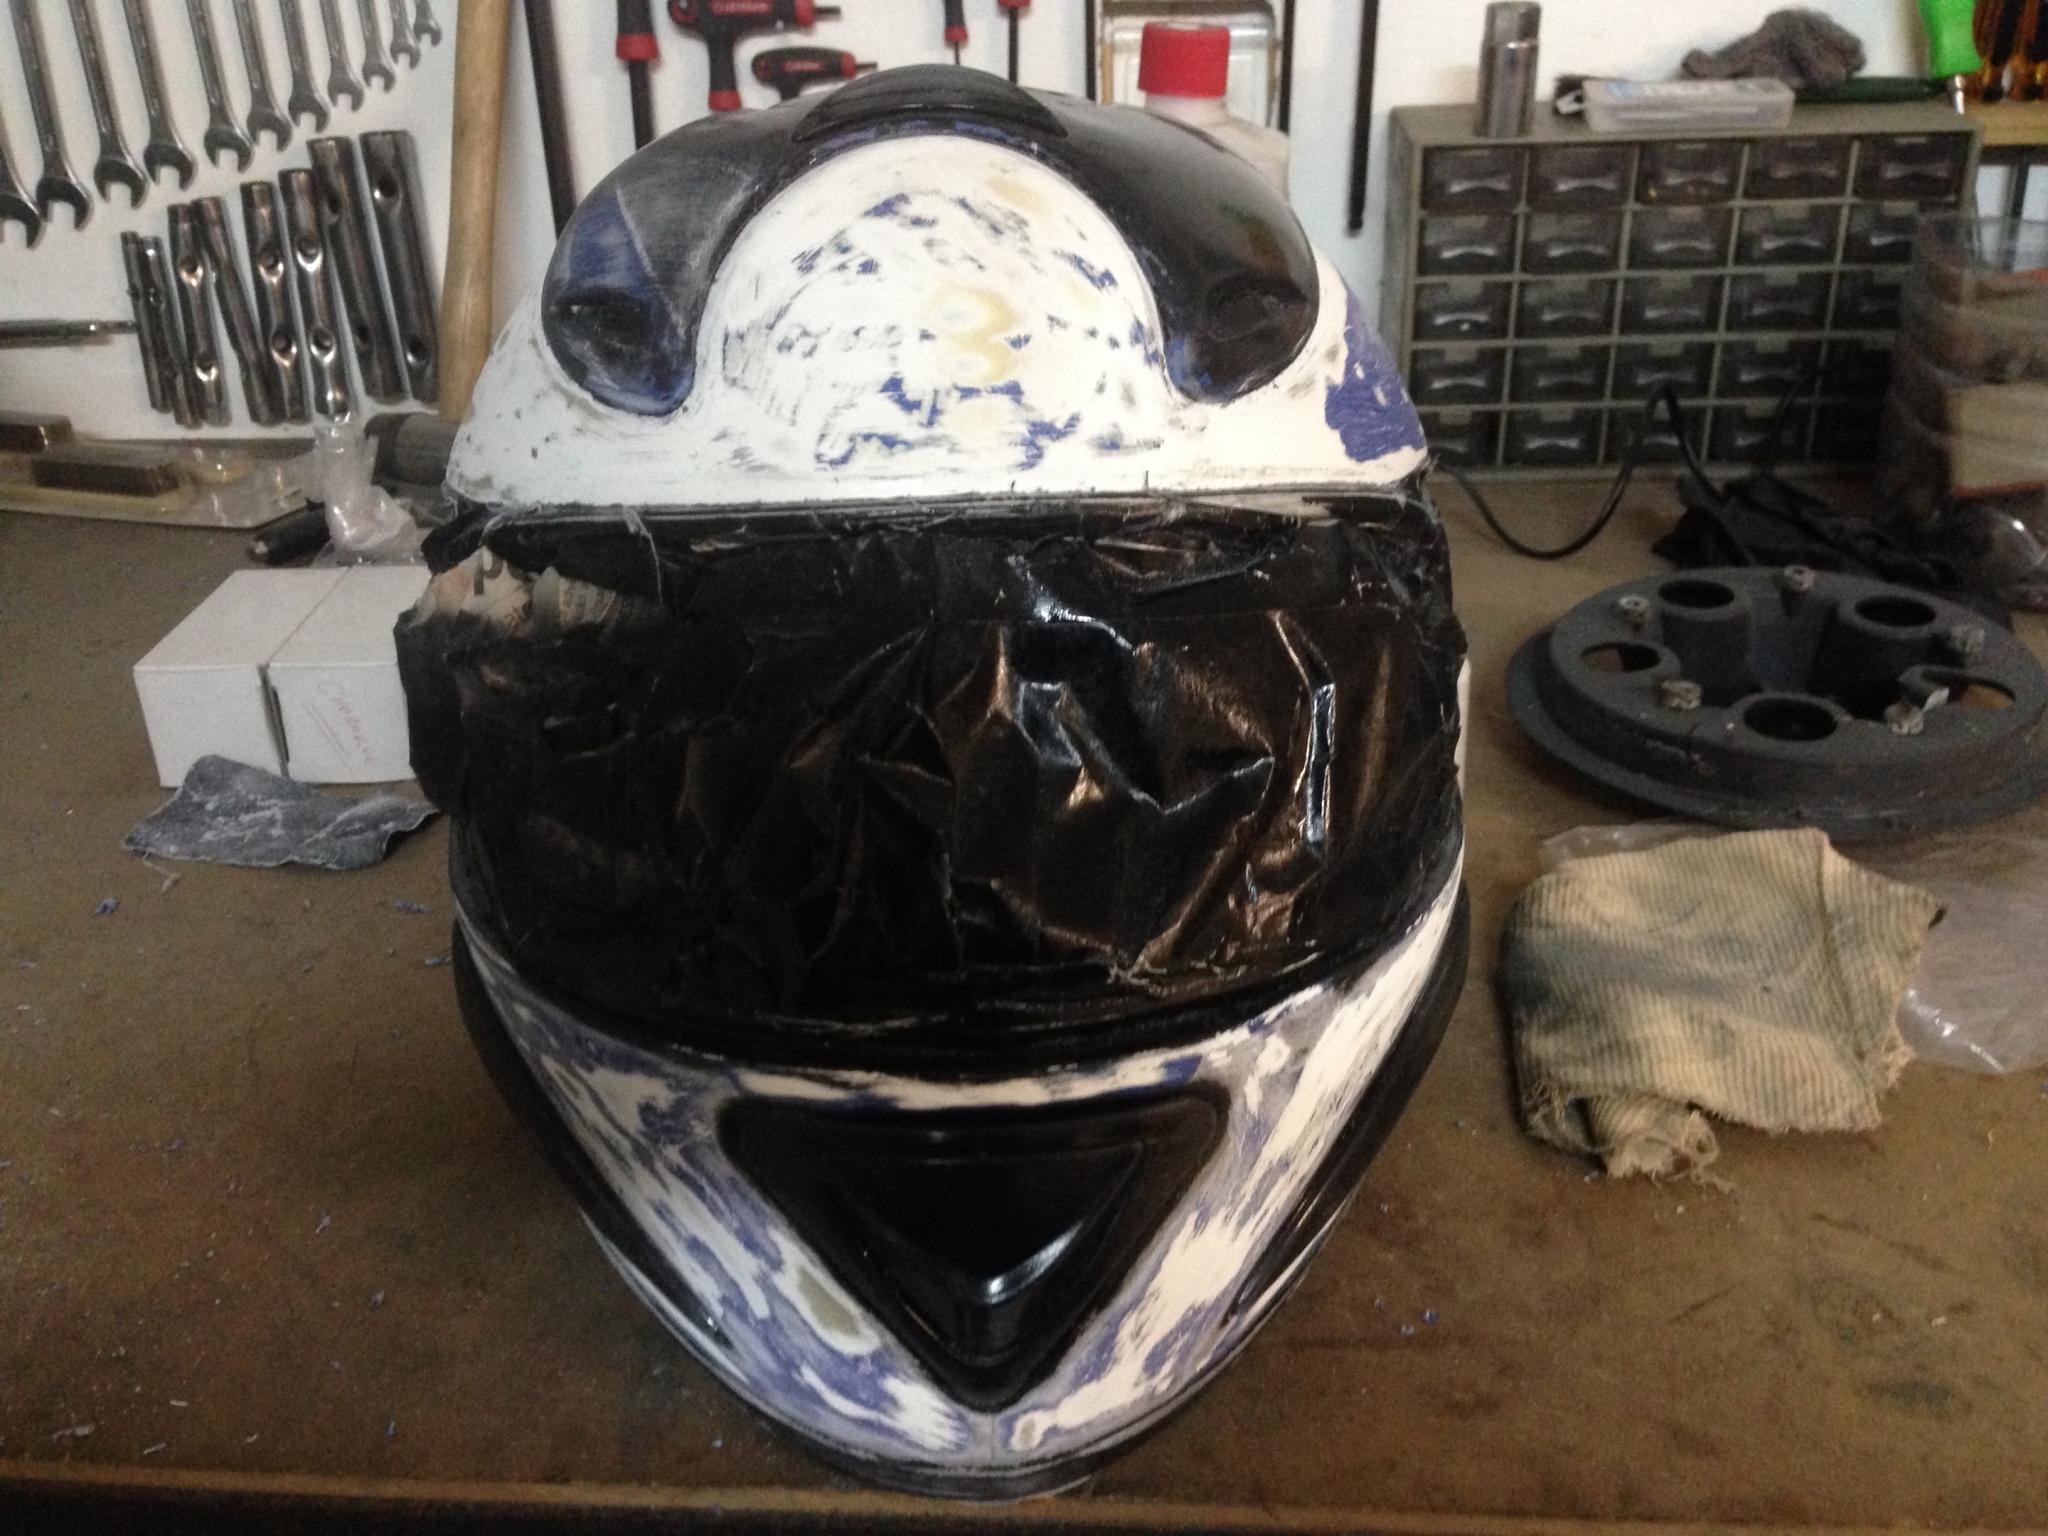 Autocolantes na moto/capacete  J7z28i